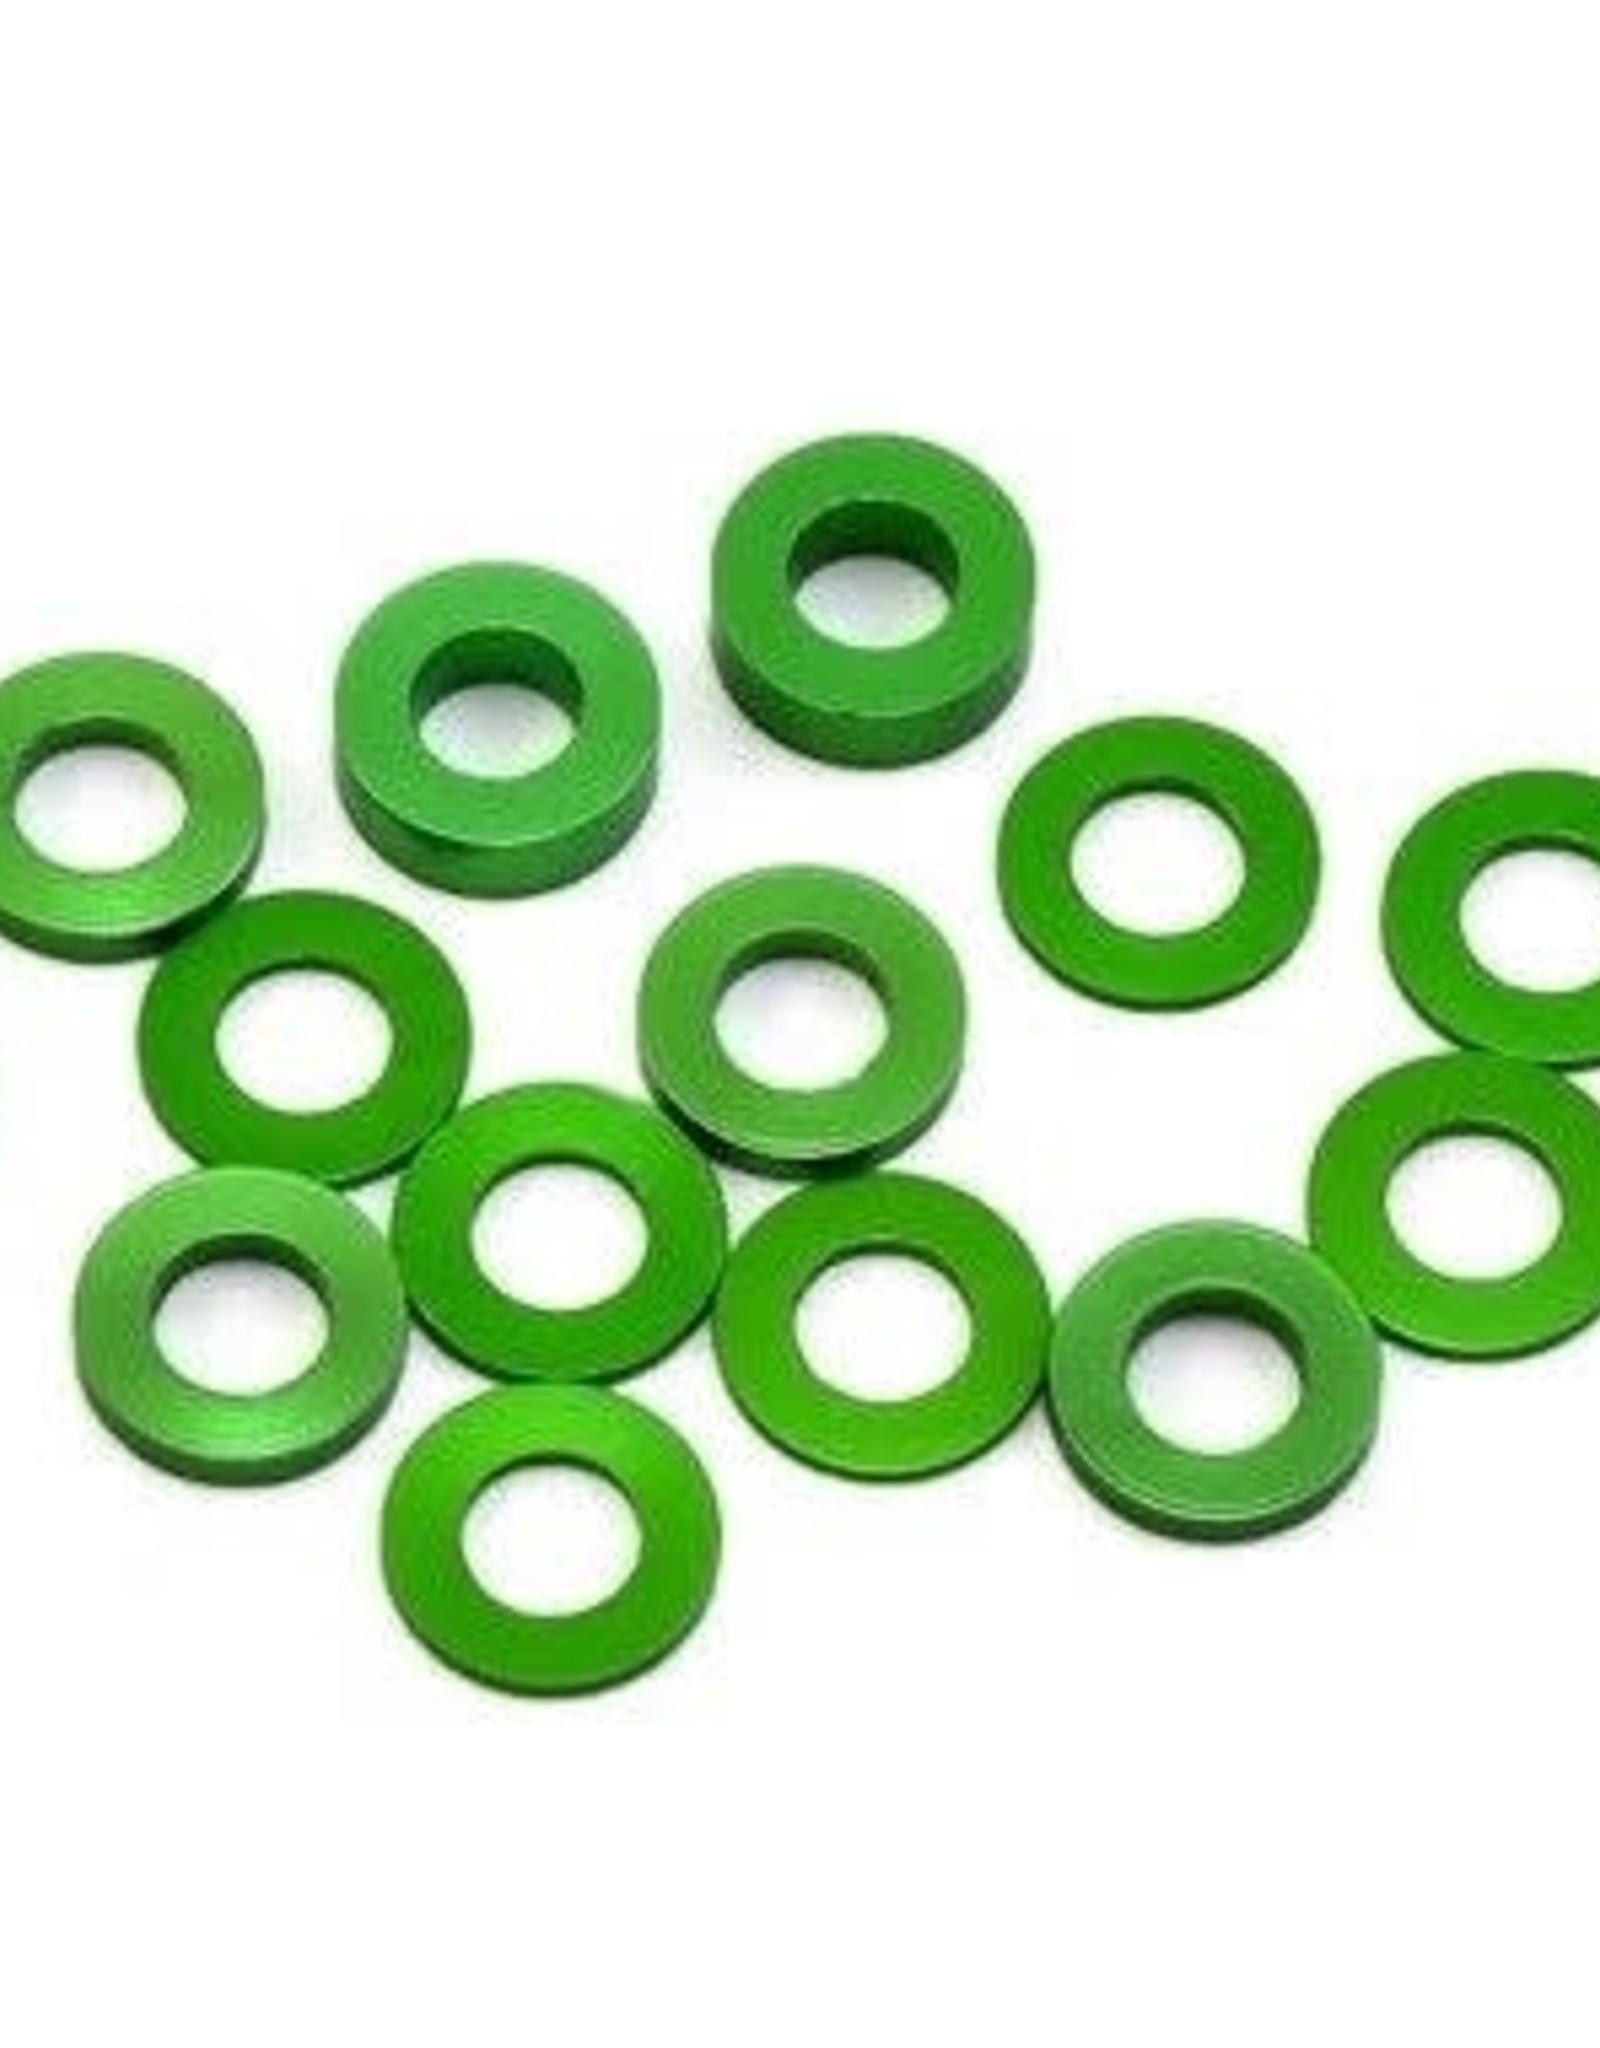 175RC 175RC m3 ballstud washers green